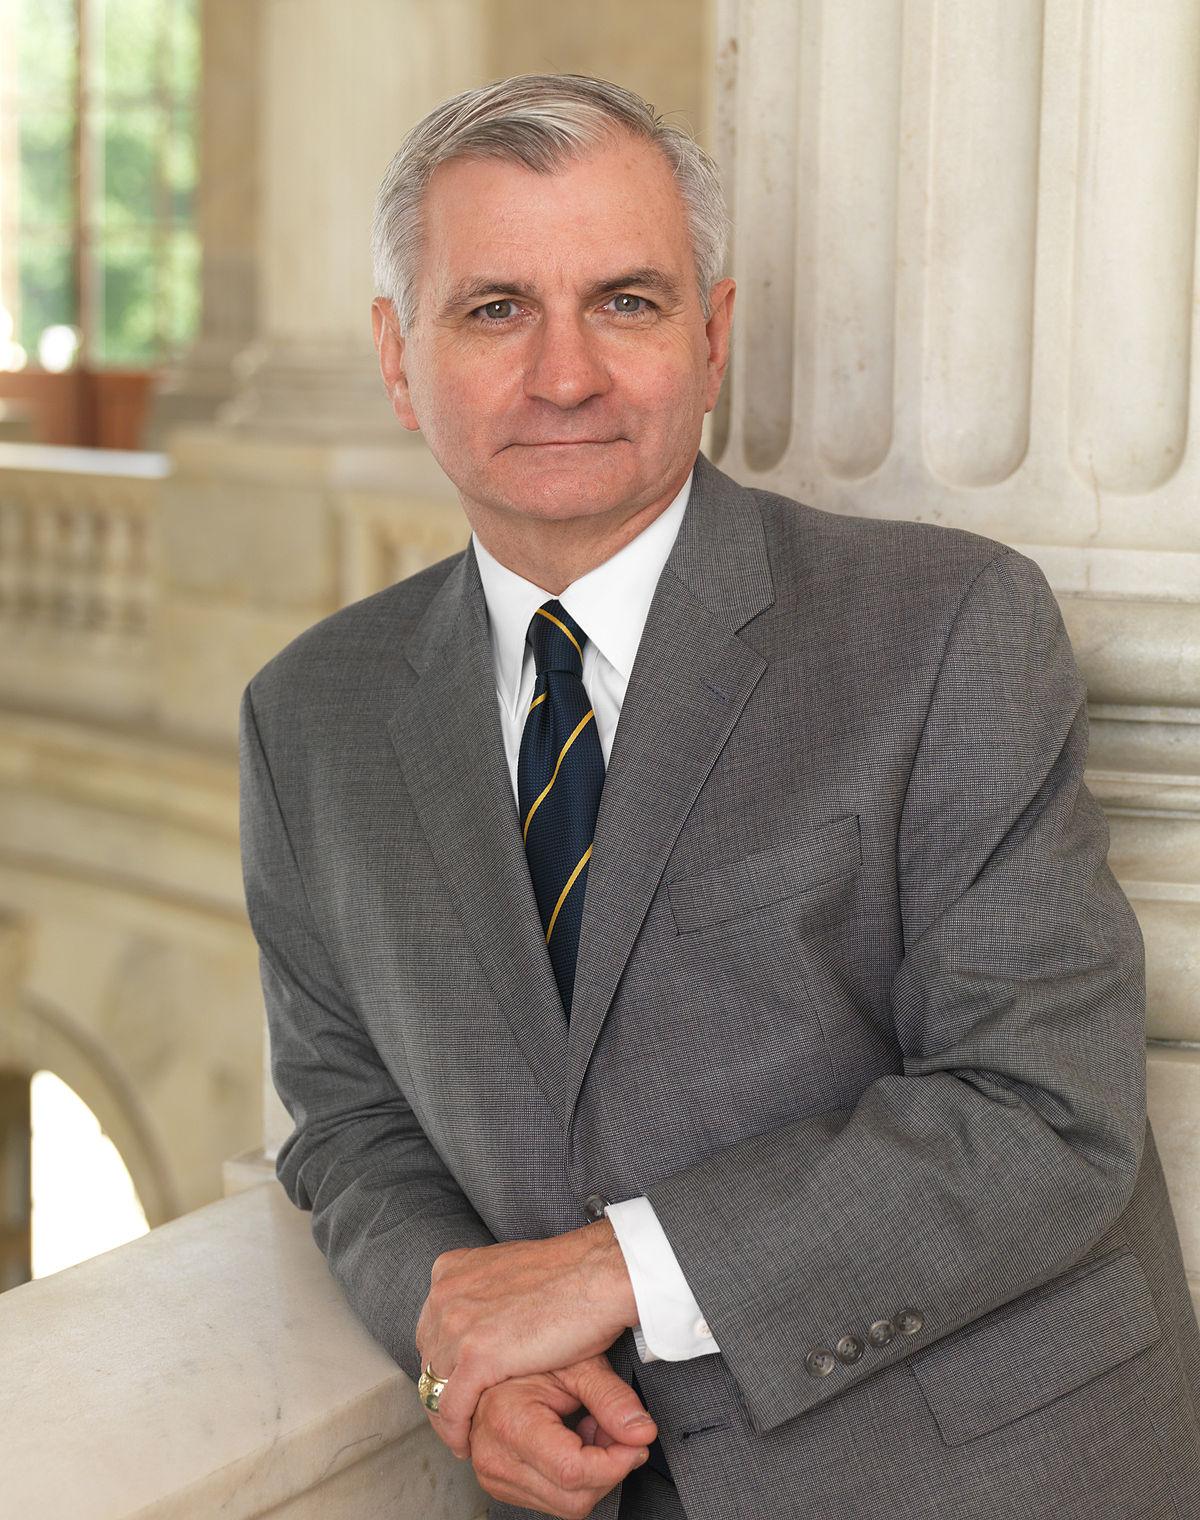 Rhode Island Senators